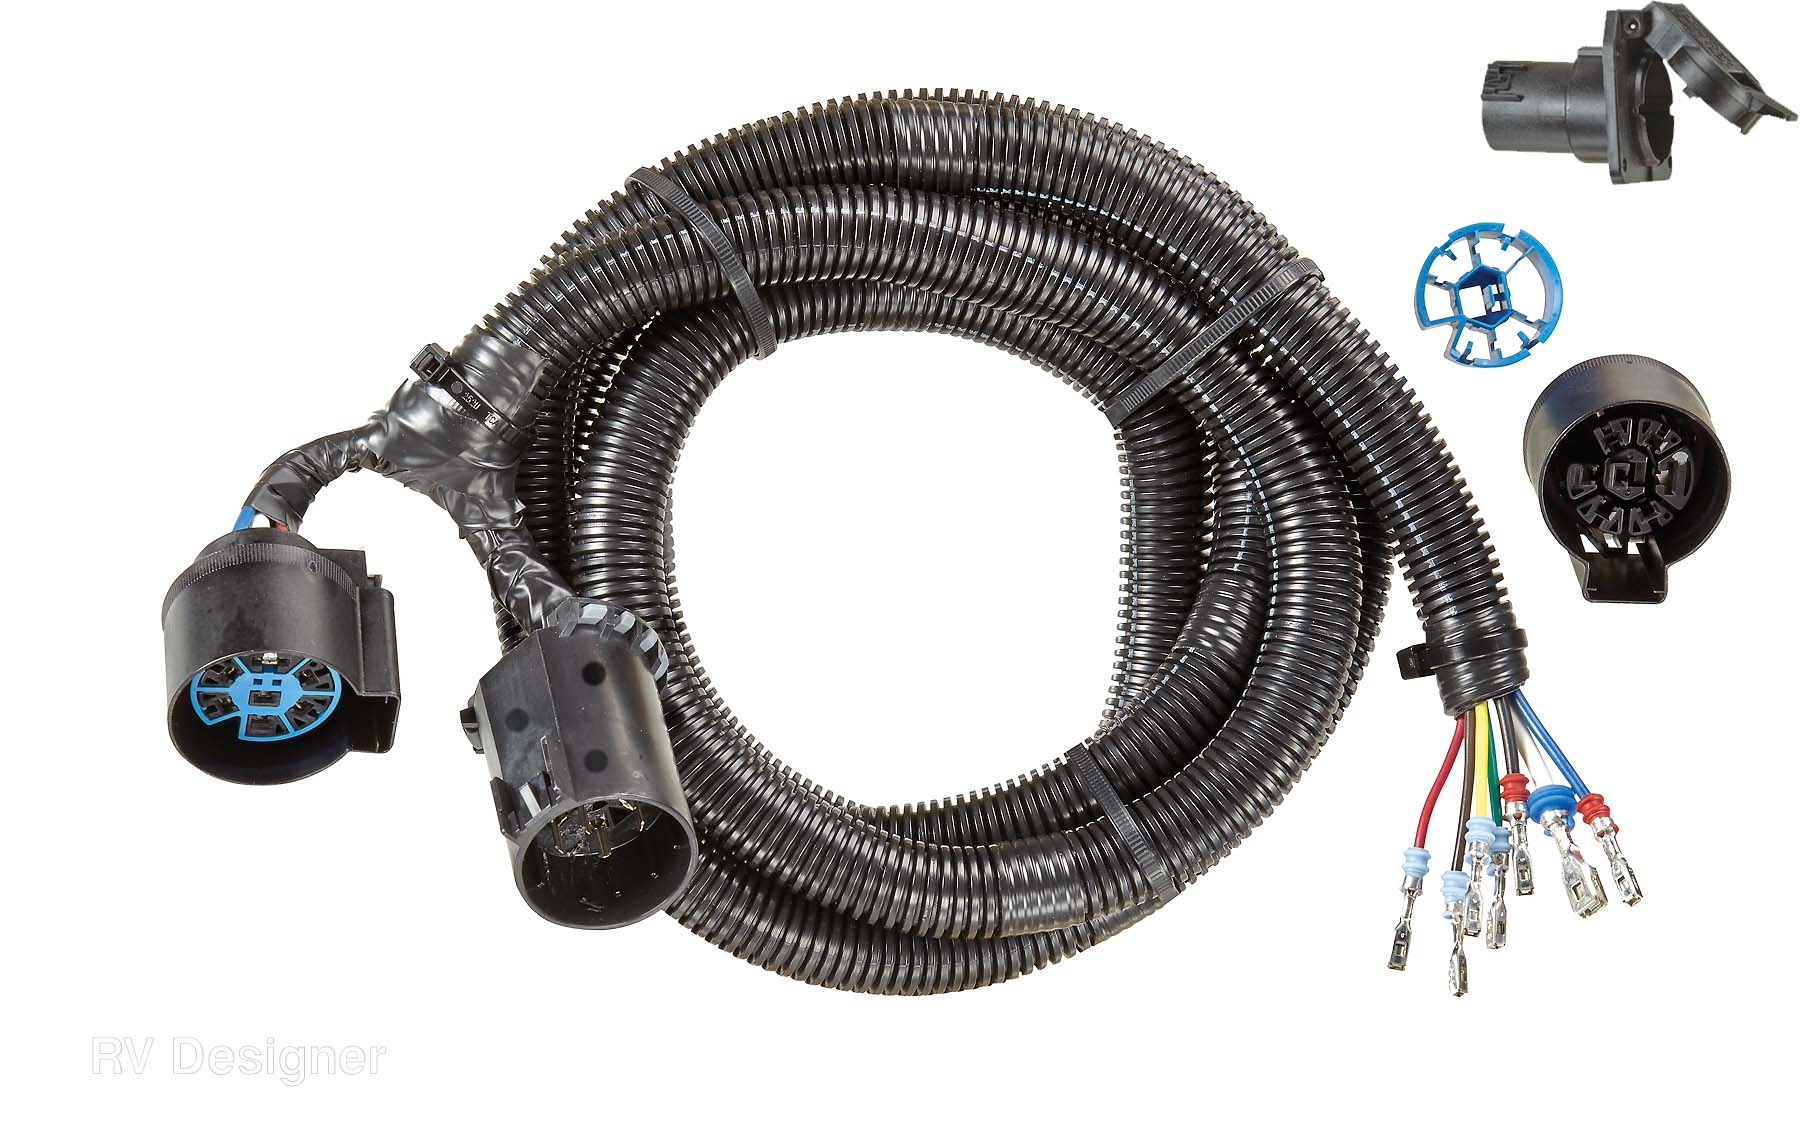 medium resolution of rv designer trailer wiring connector kit p935 end type t connector walmart canada